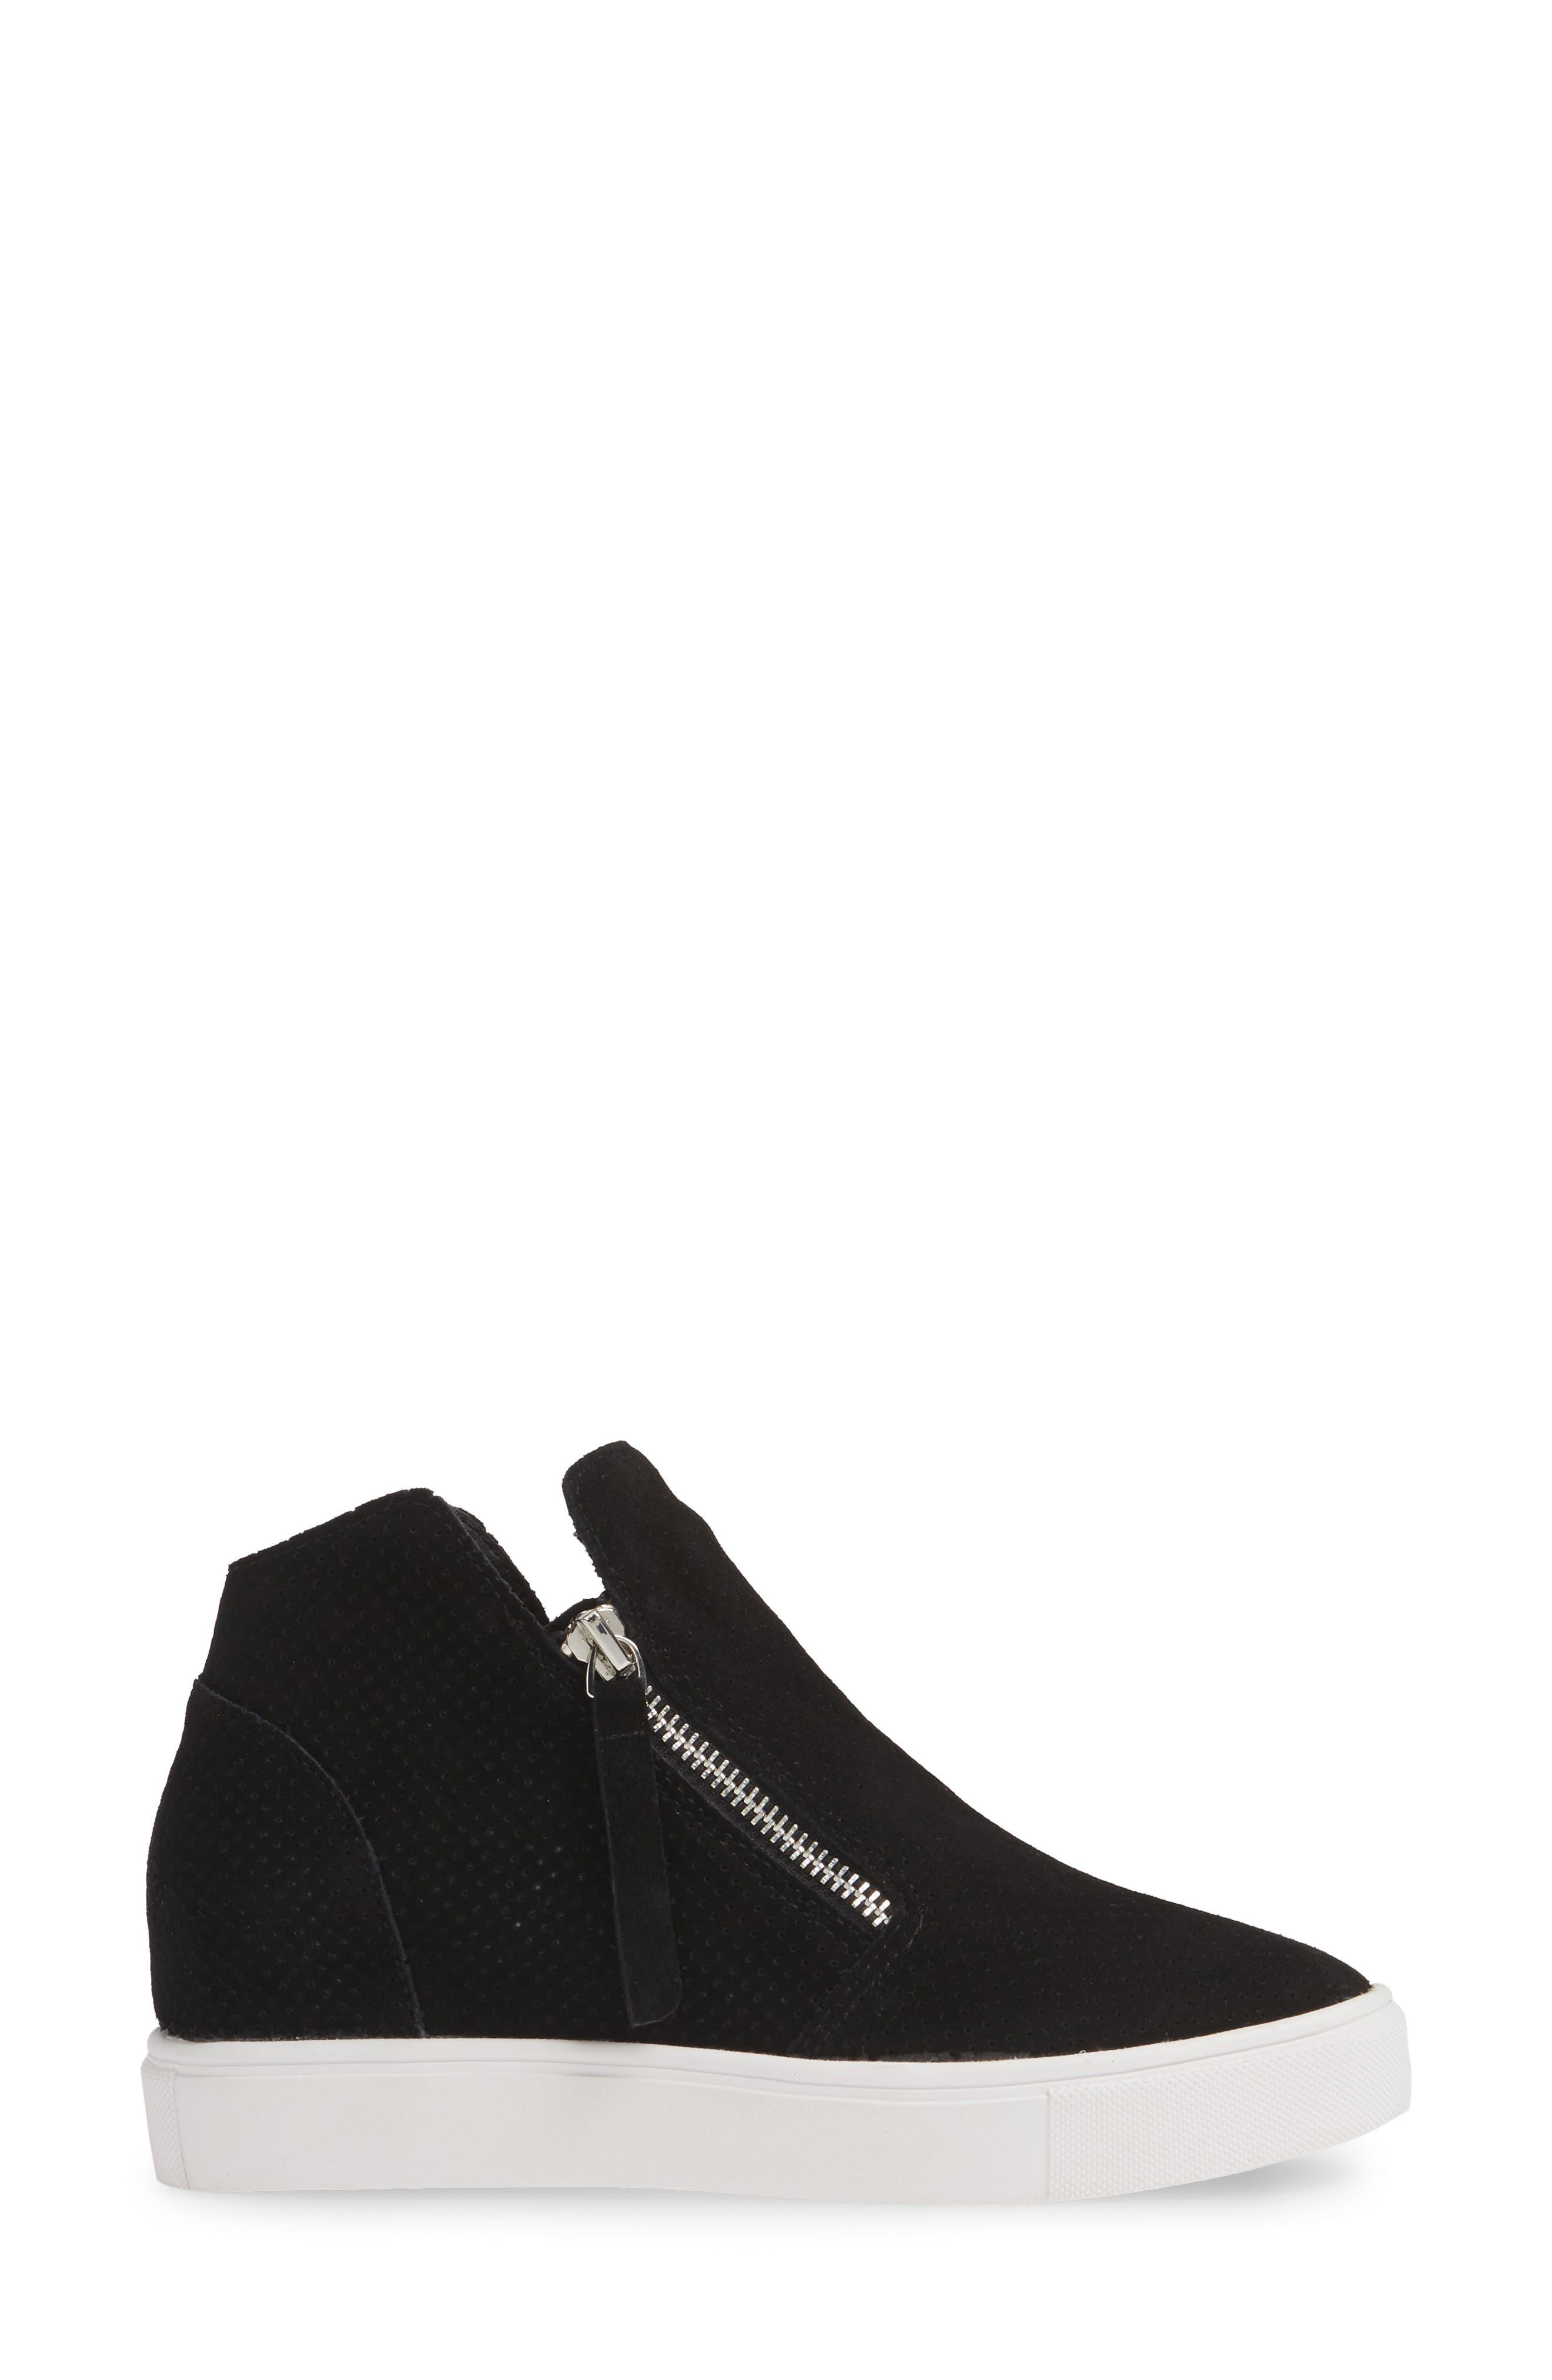 STEVE MADDEN, Caliber High Top Sneaker, Alternate thumbnail 3, color, BLACK SUEDE